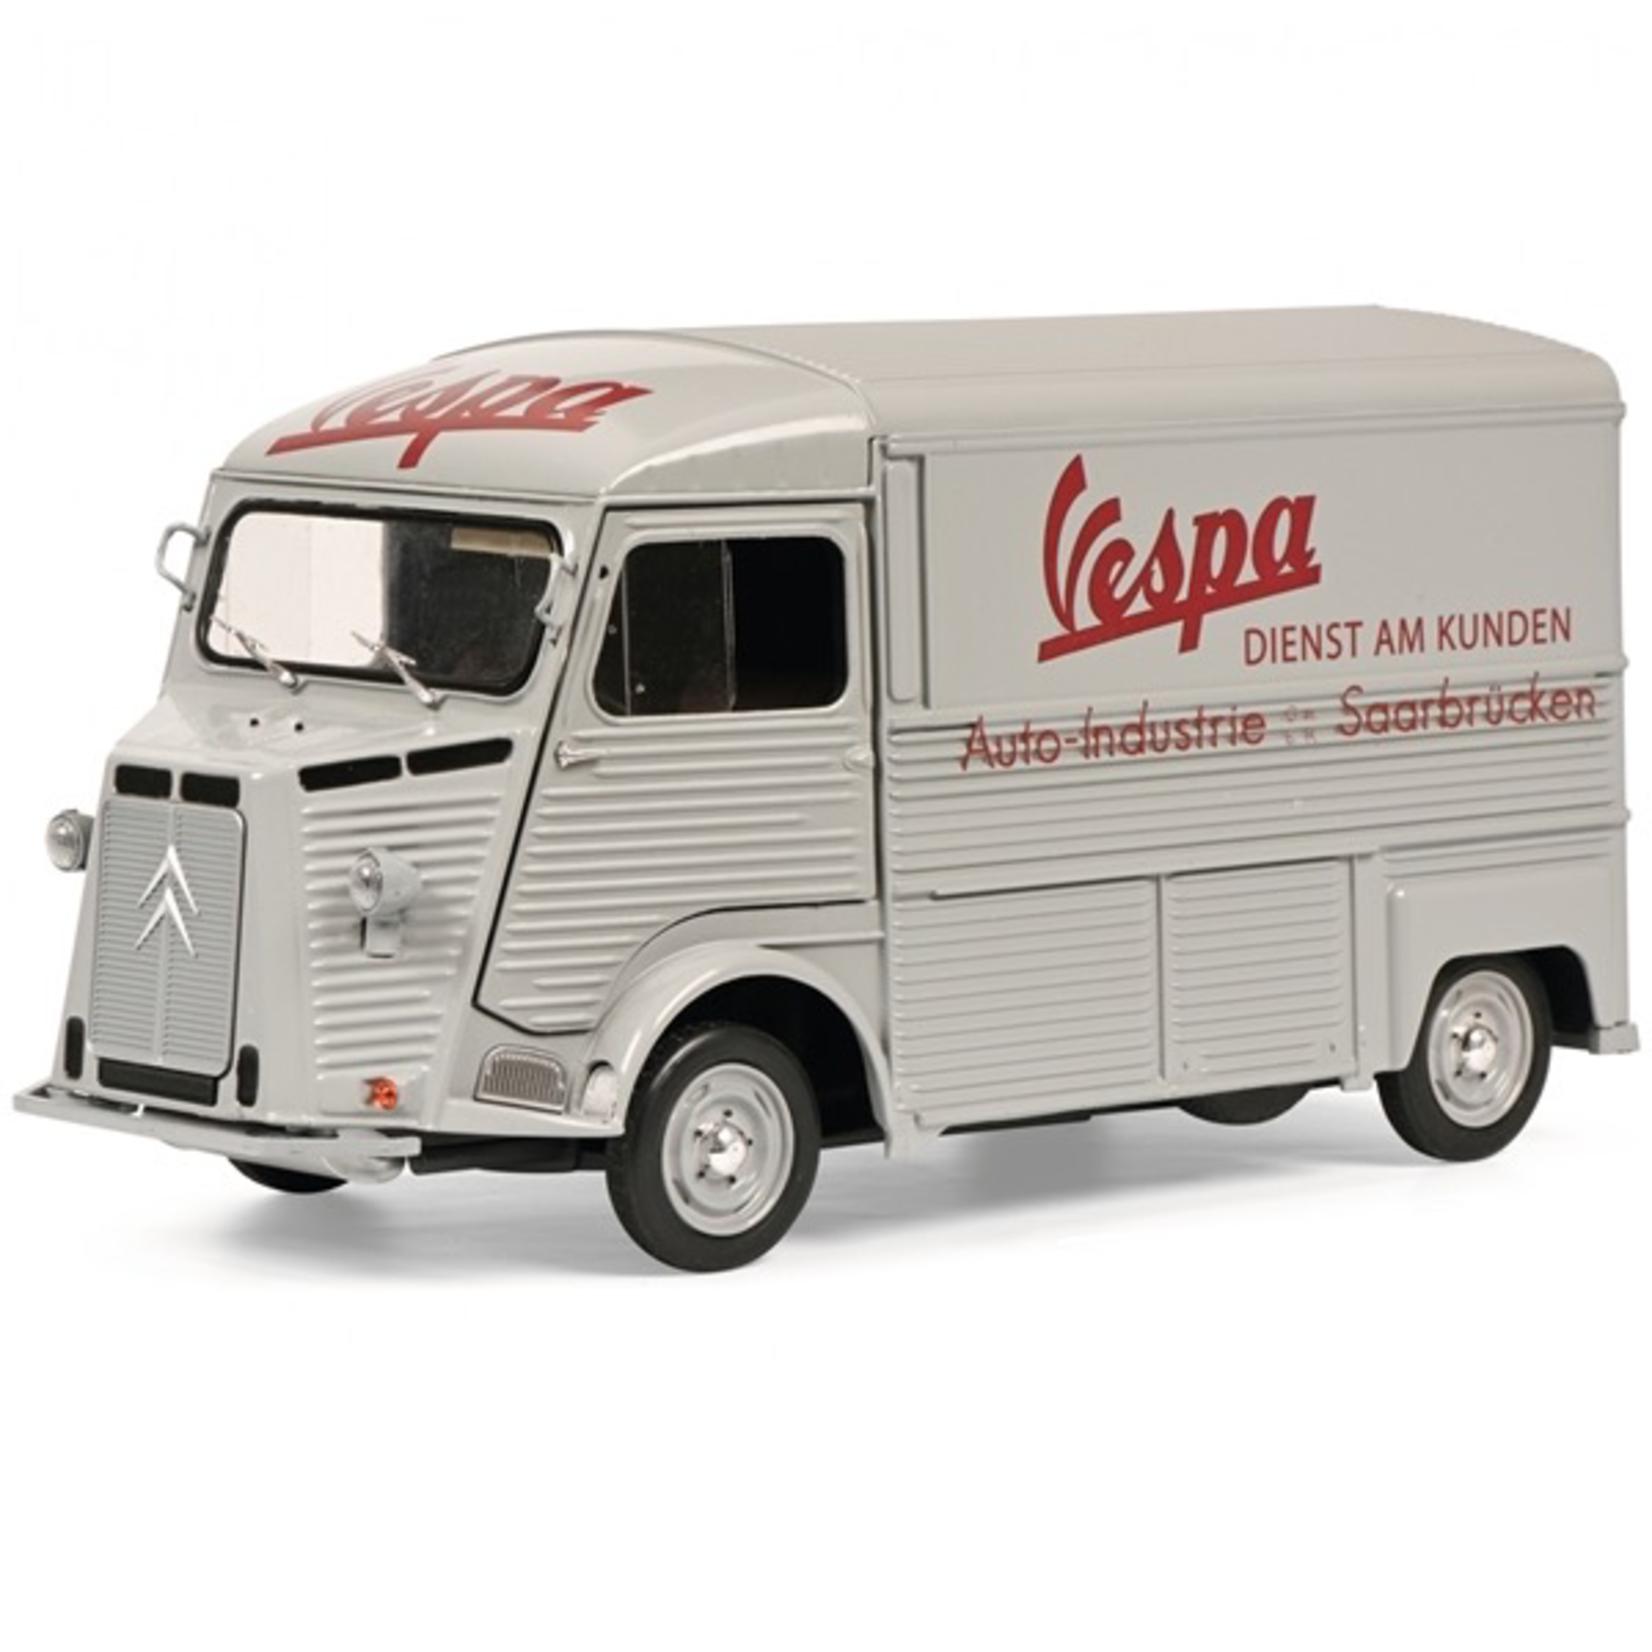 Lifestyle Toy, Schuco Vespa Citroen service truck (Limited 500 edition)